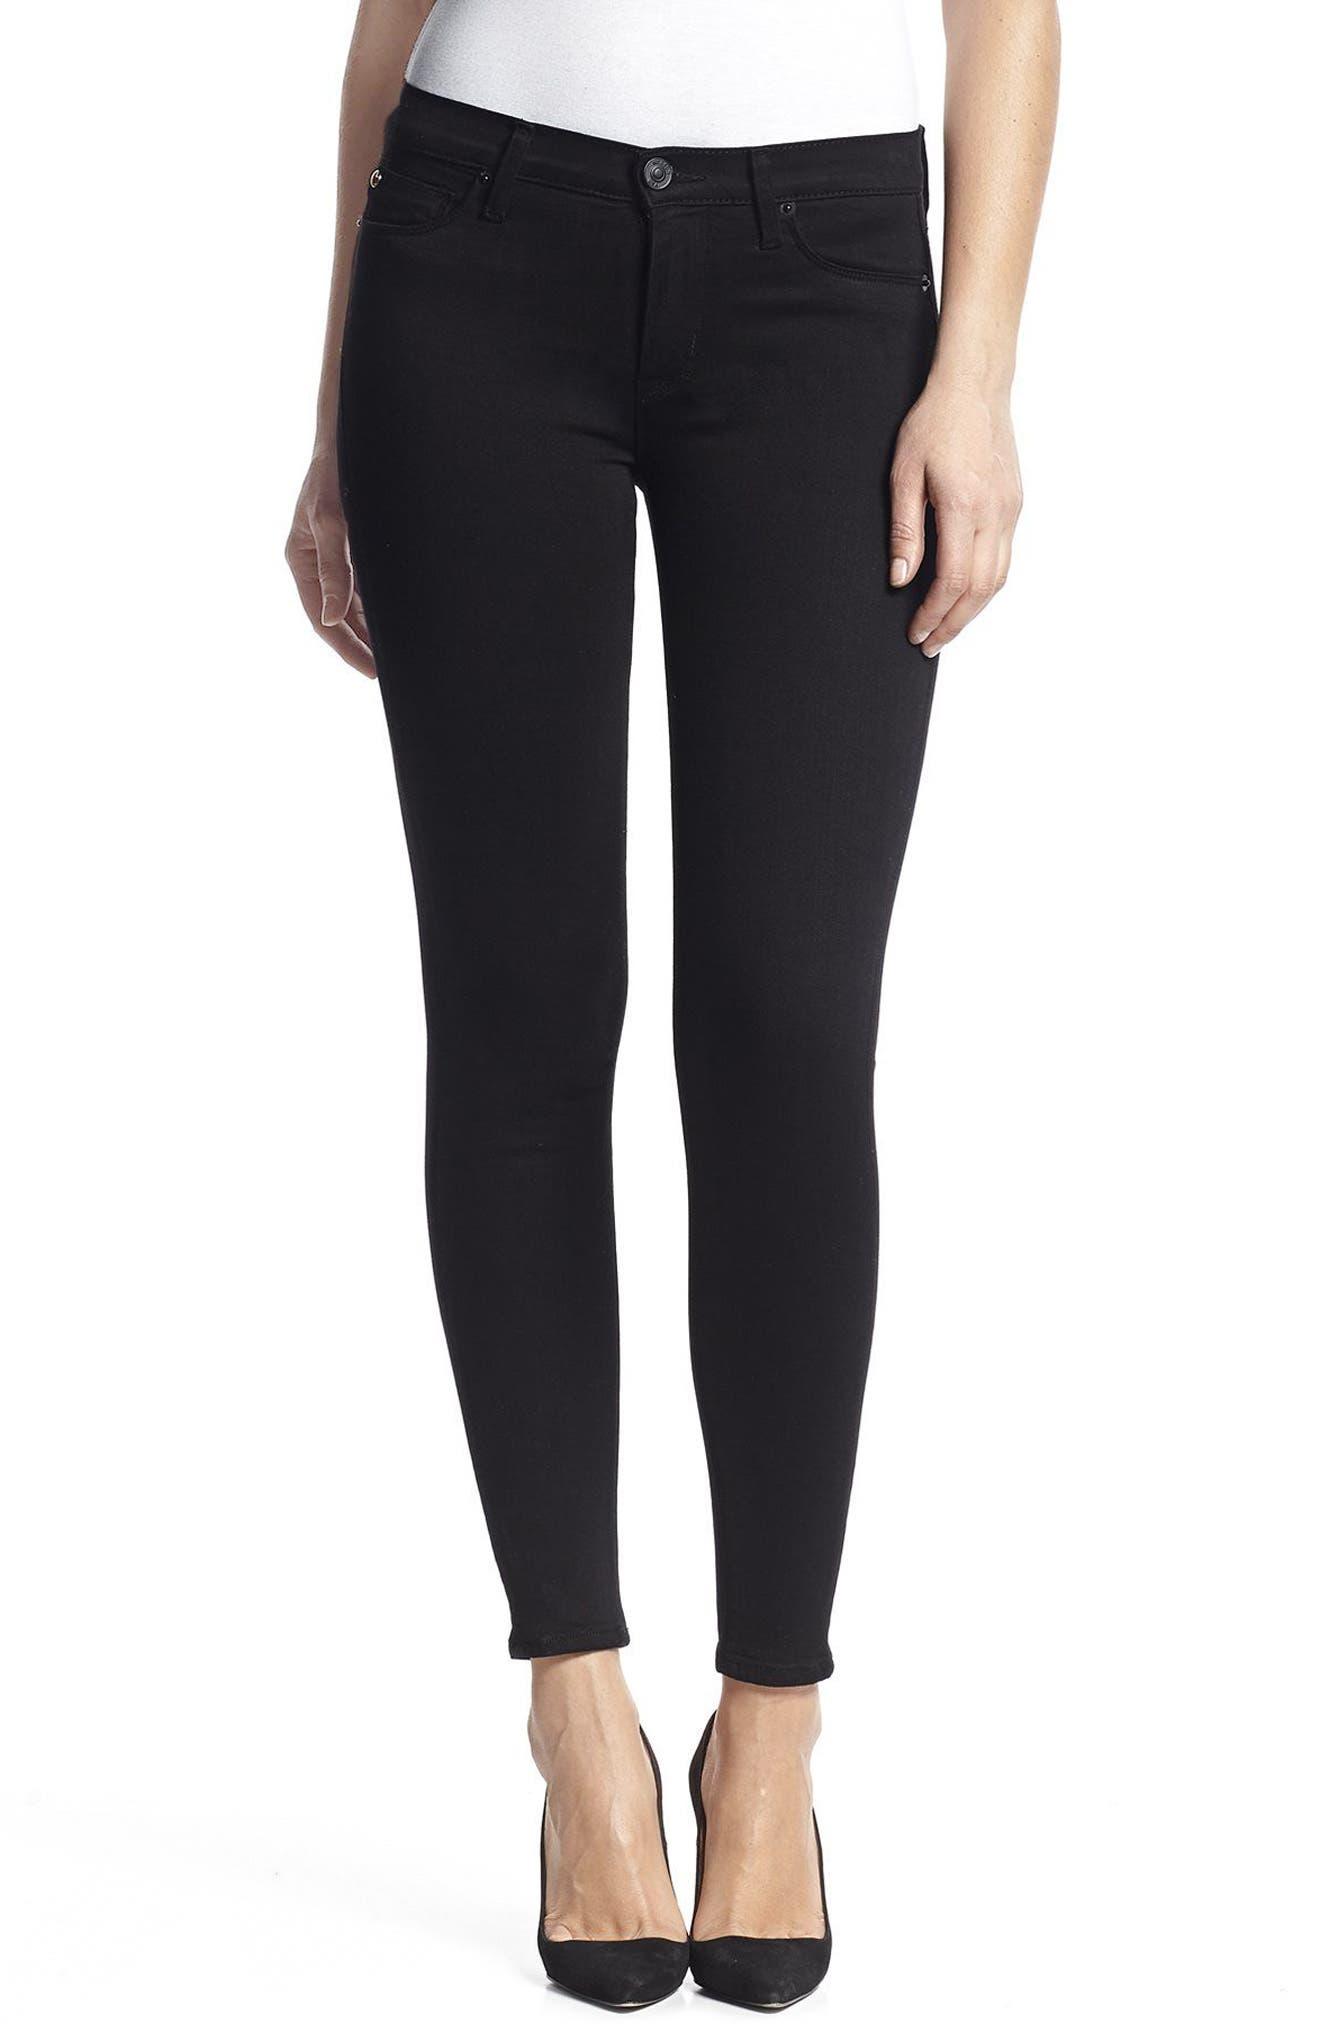 Main Image - Hudson Jeans Nico Supermodel Super Skinny Jeans (Long)